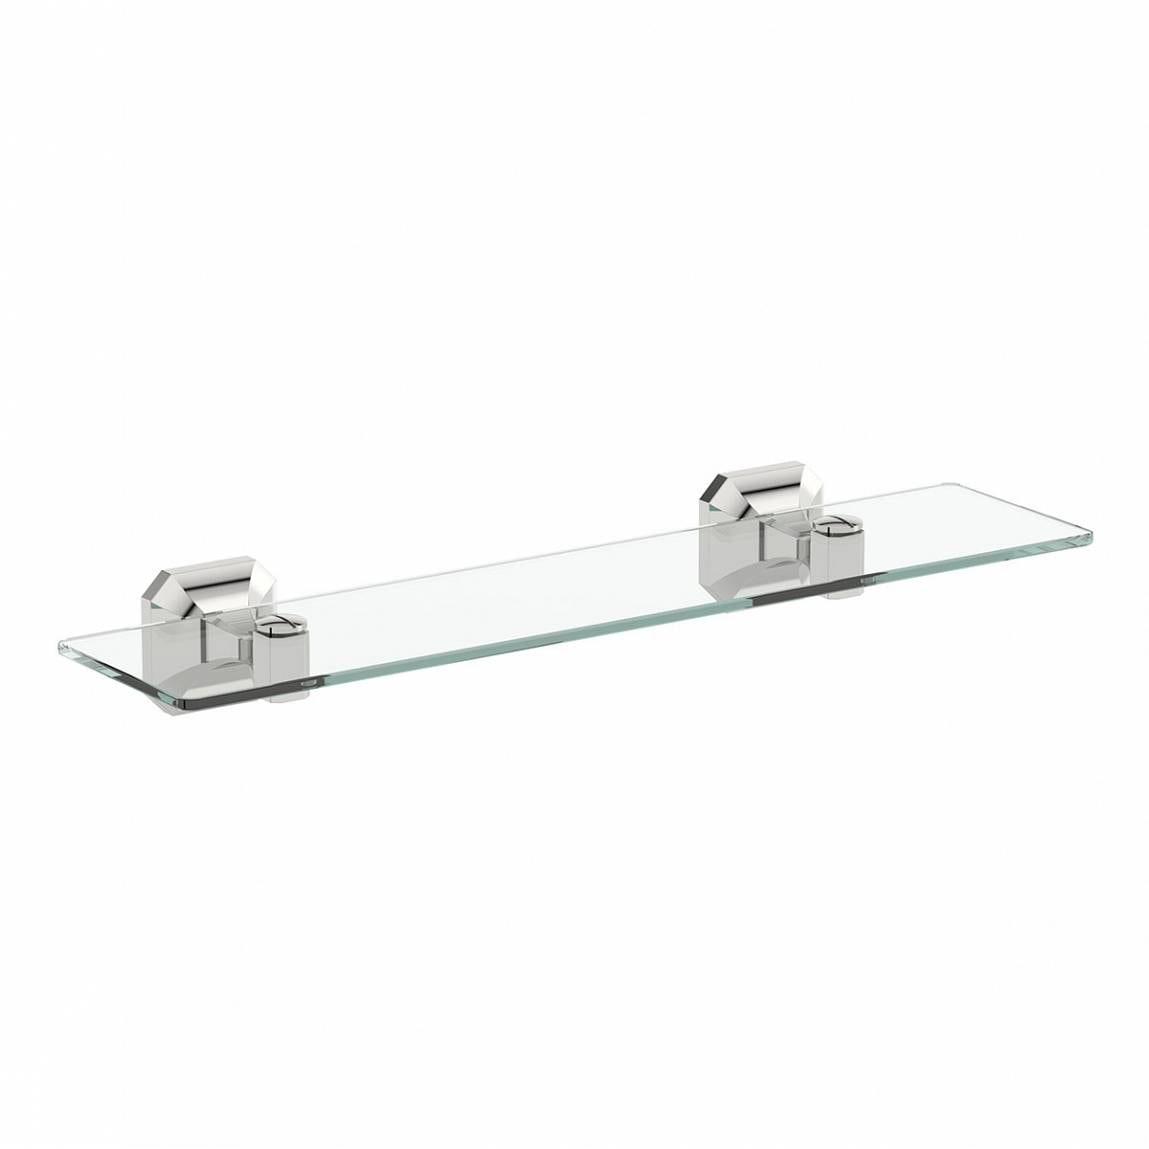 The Bath Co. Camberley glass shelf